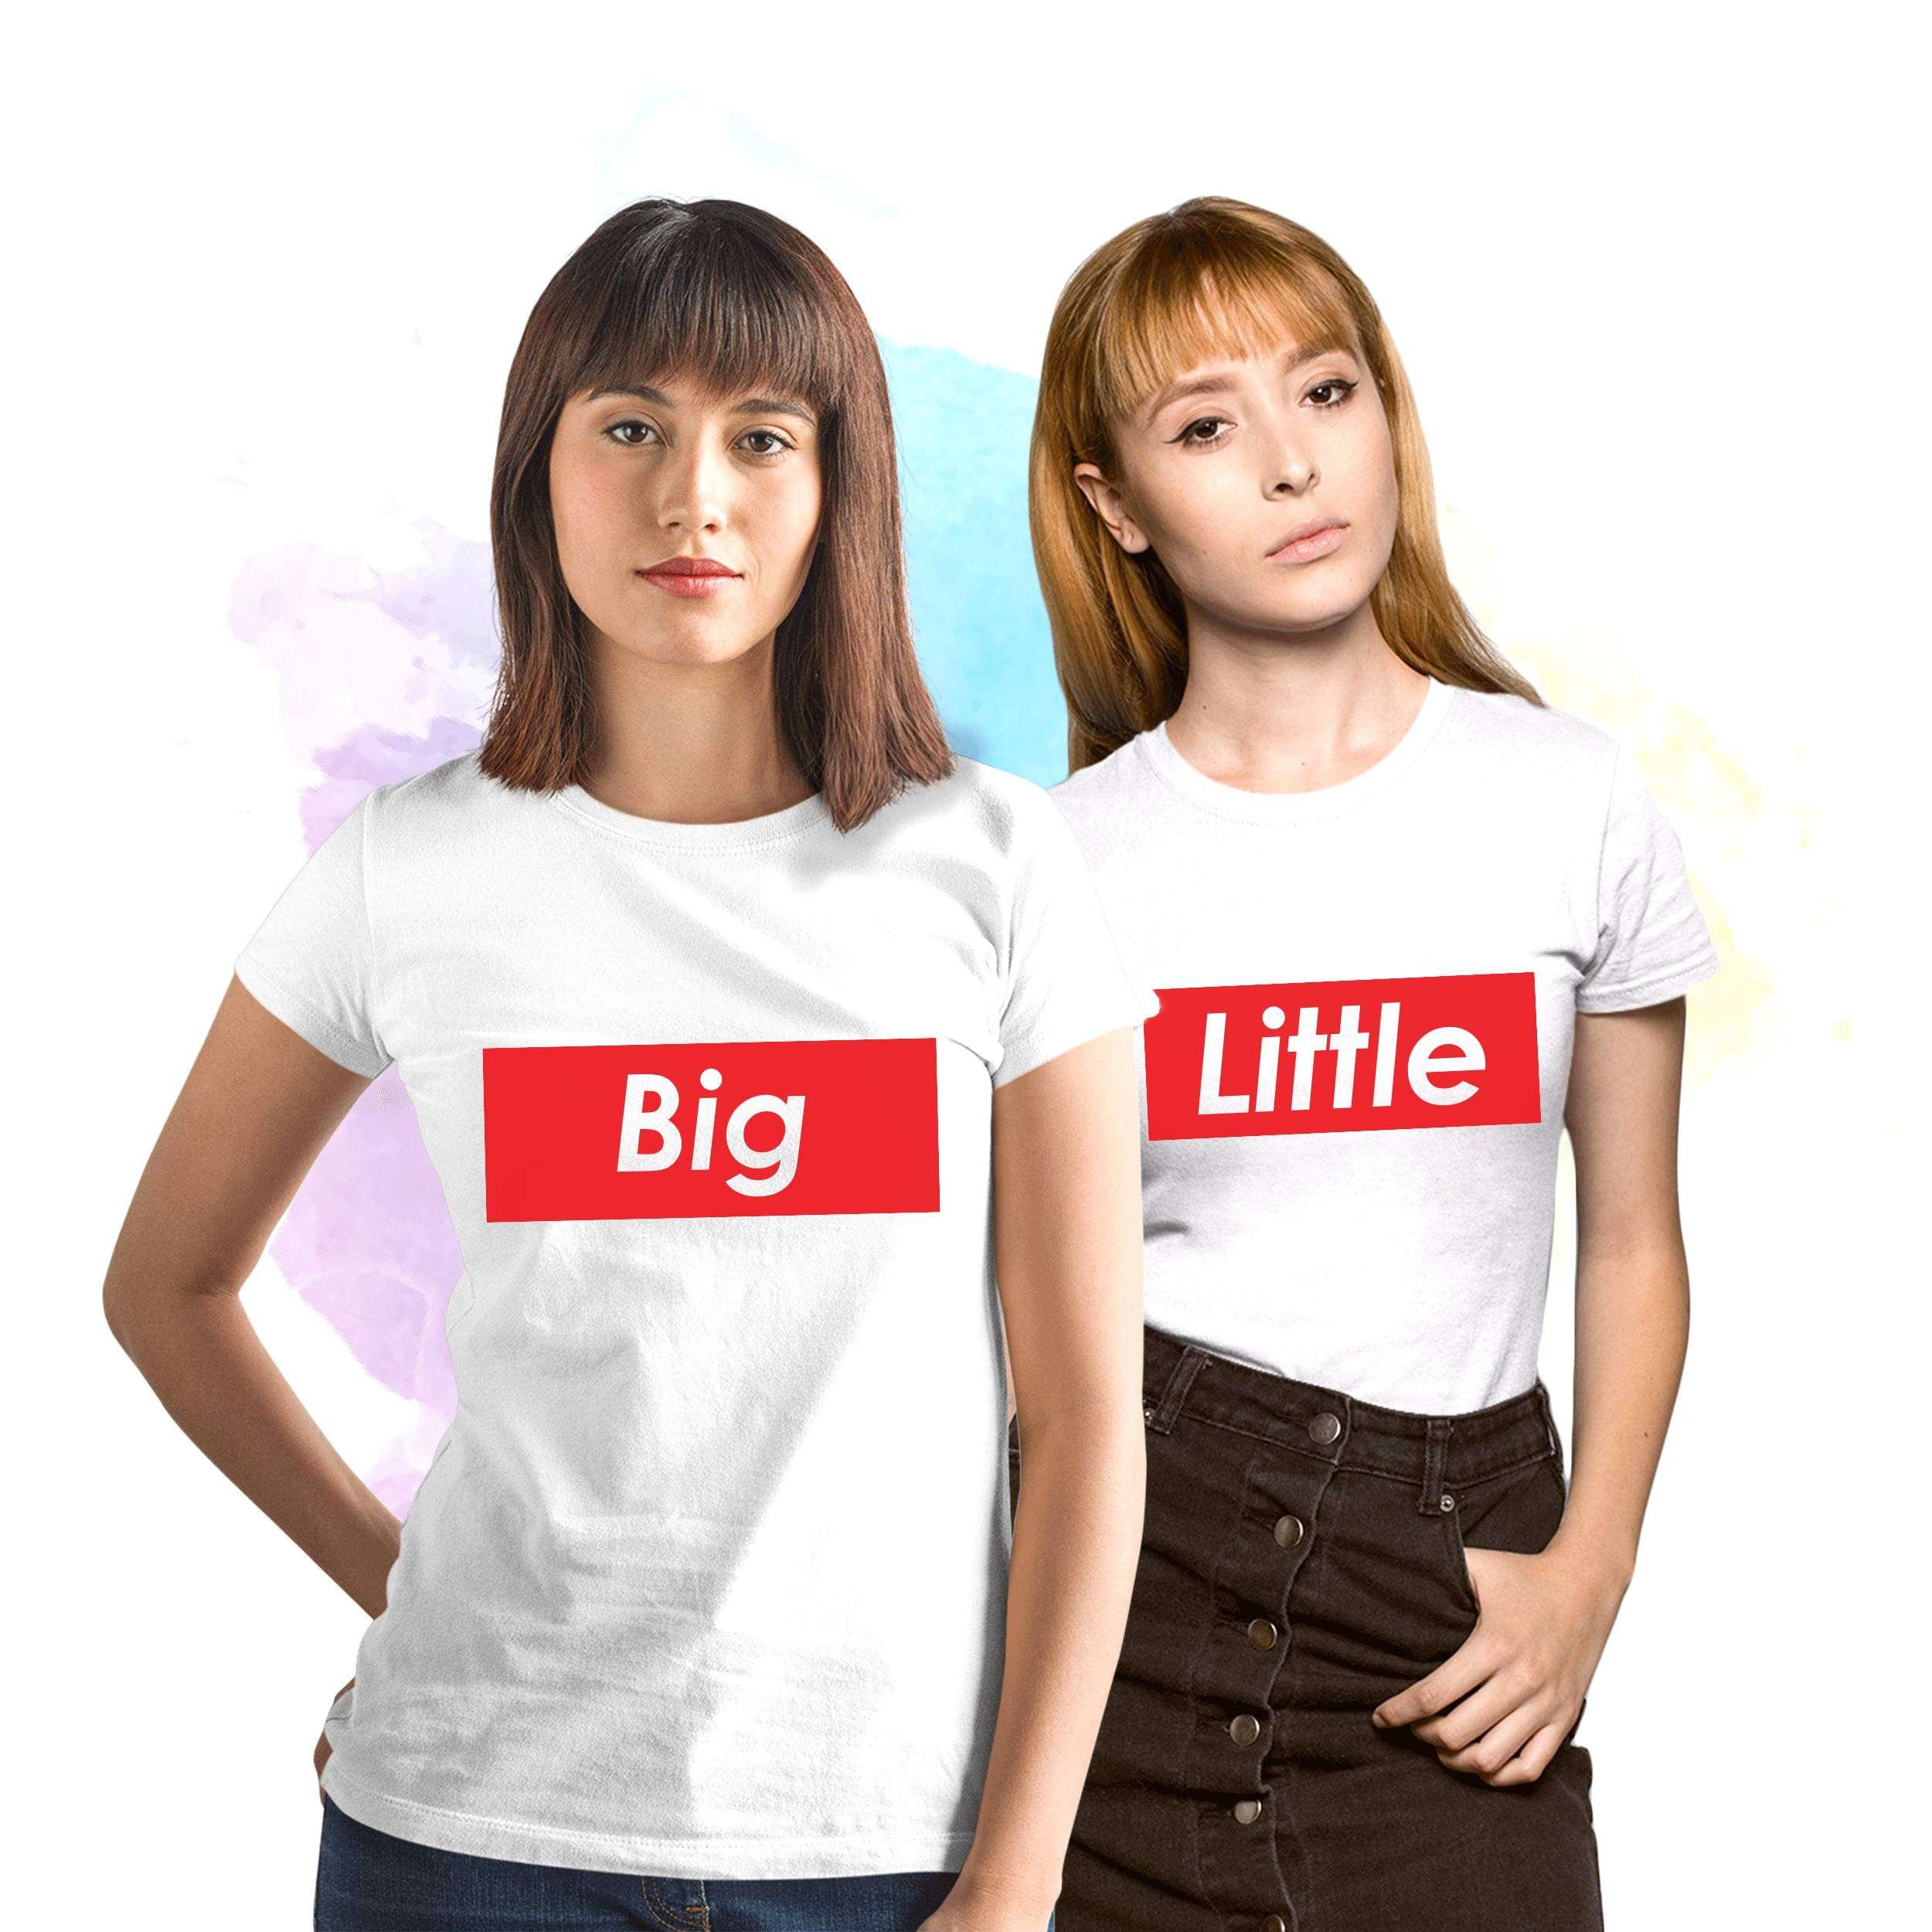 a735e129f Big Little Gift, Sorority Shirts, Supreme Style, Best Friends Shirts